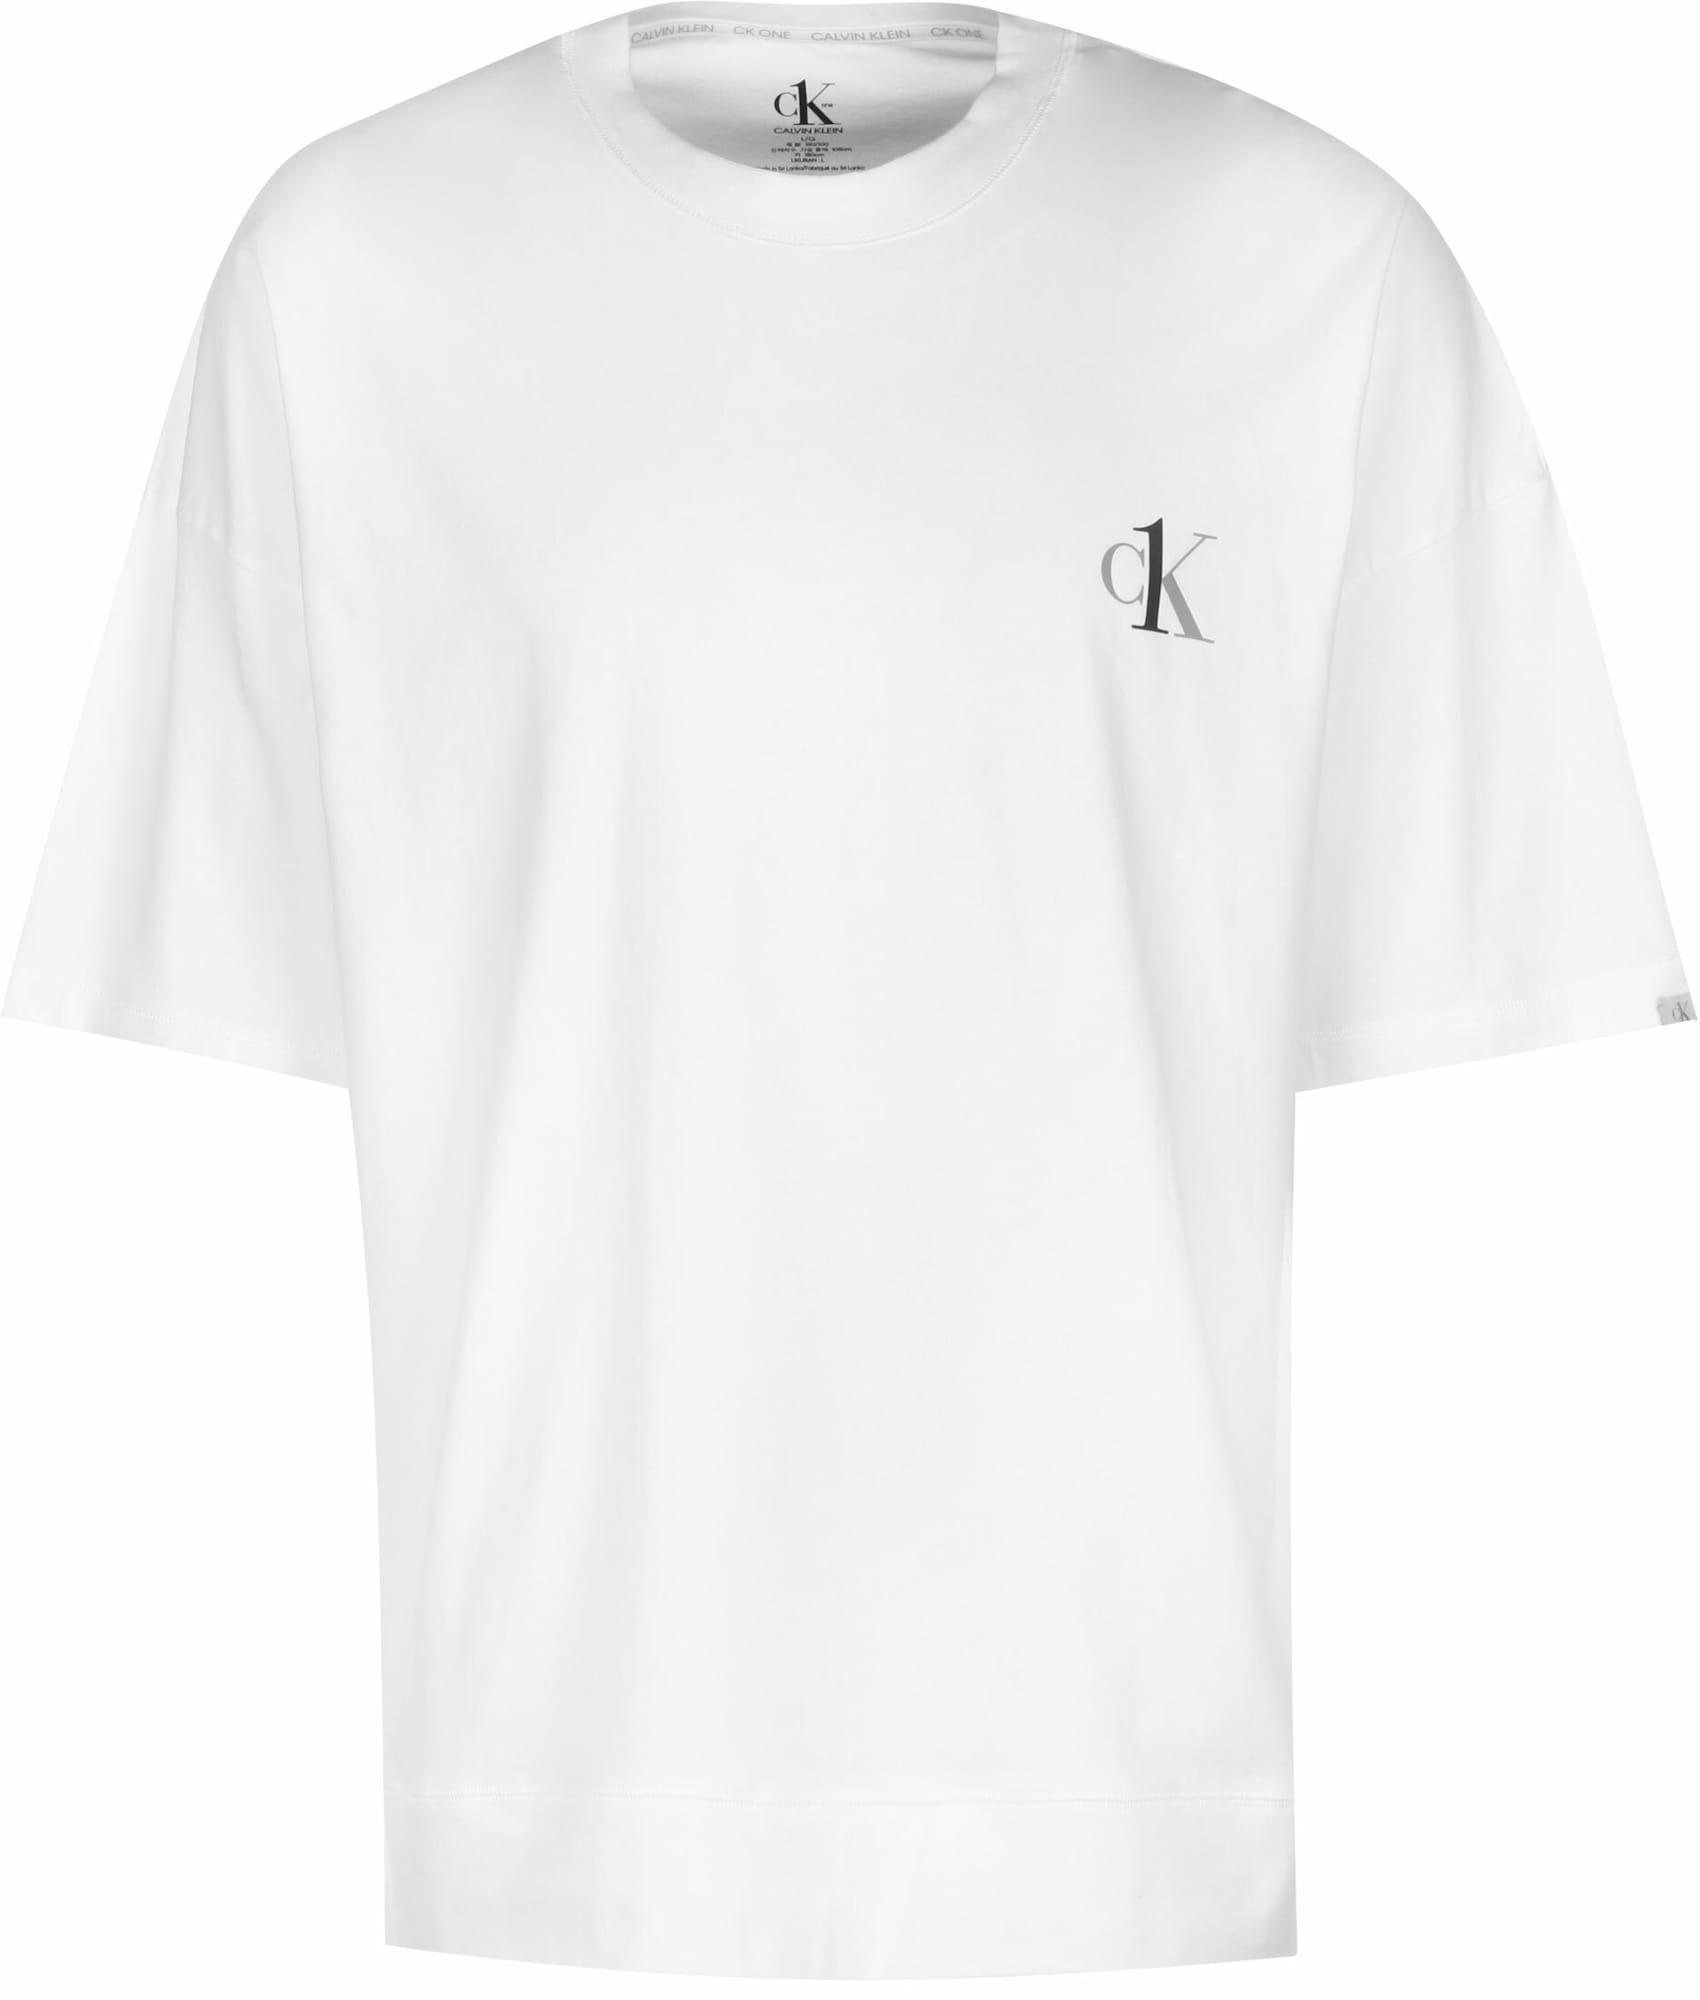 Calvin Klein Underwear Trumpa pižama balta